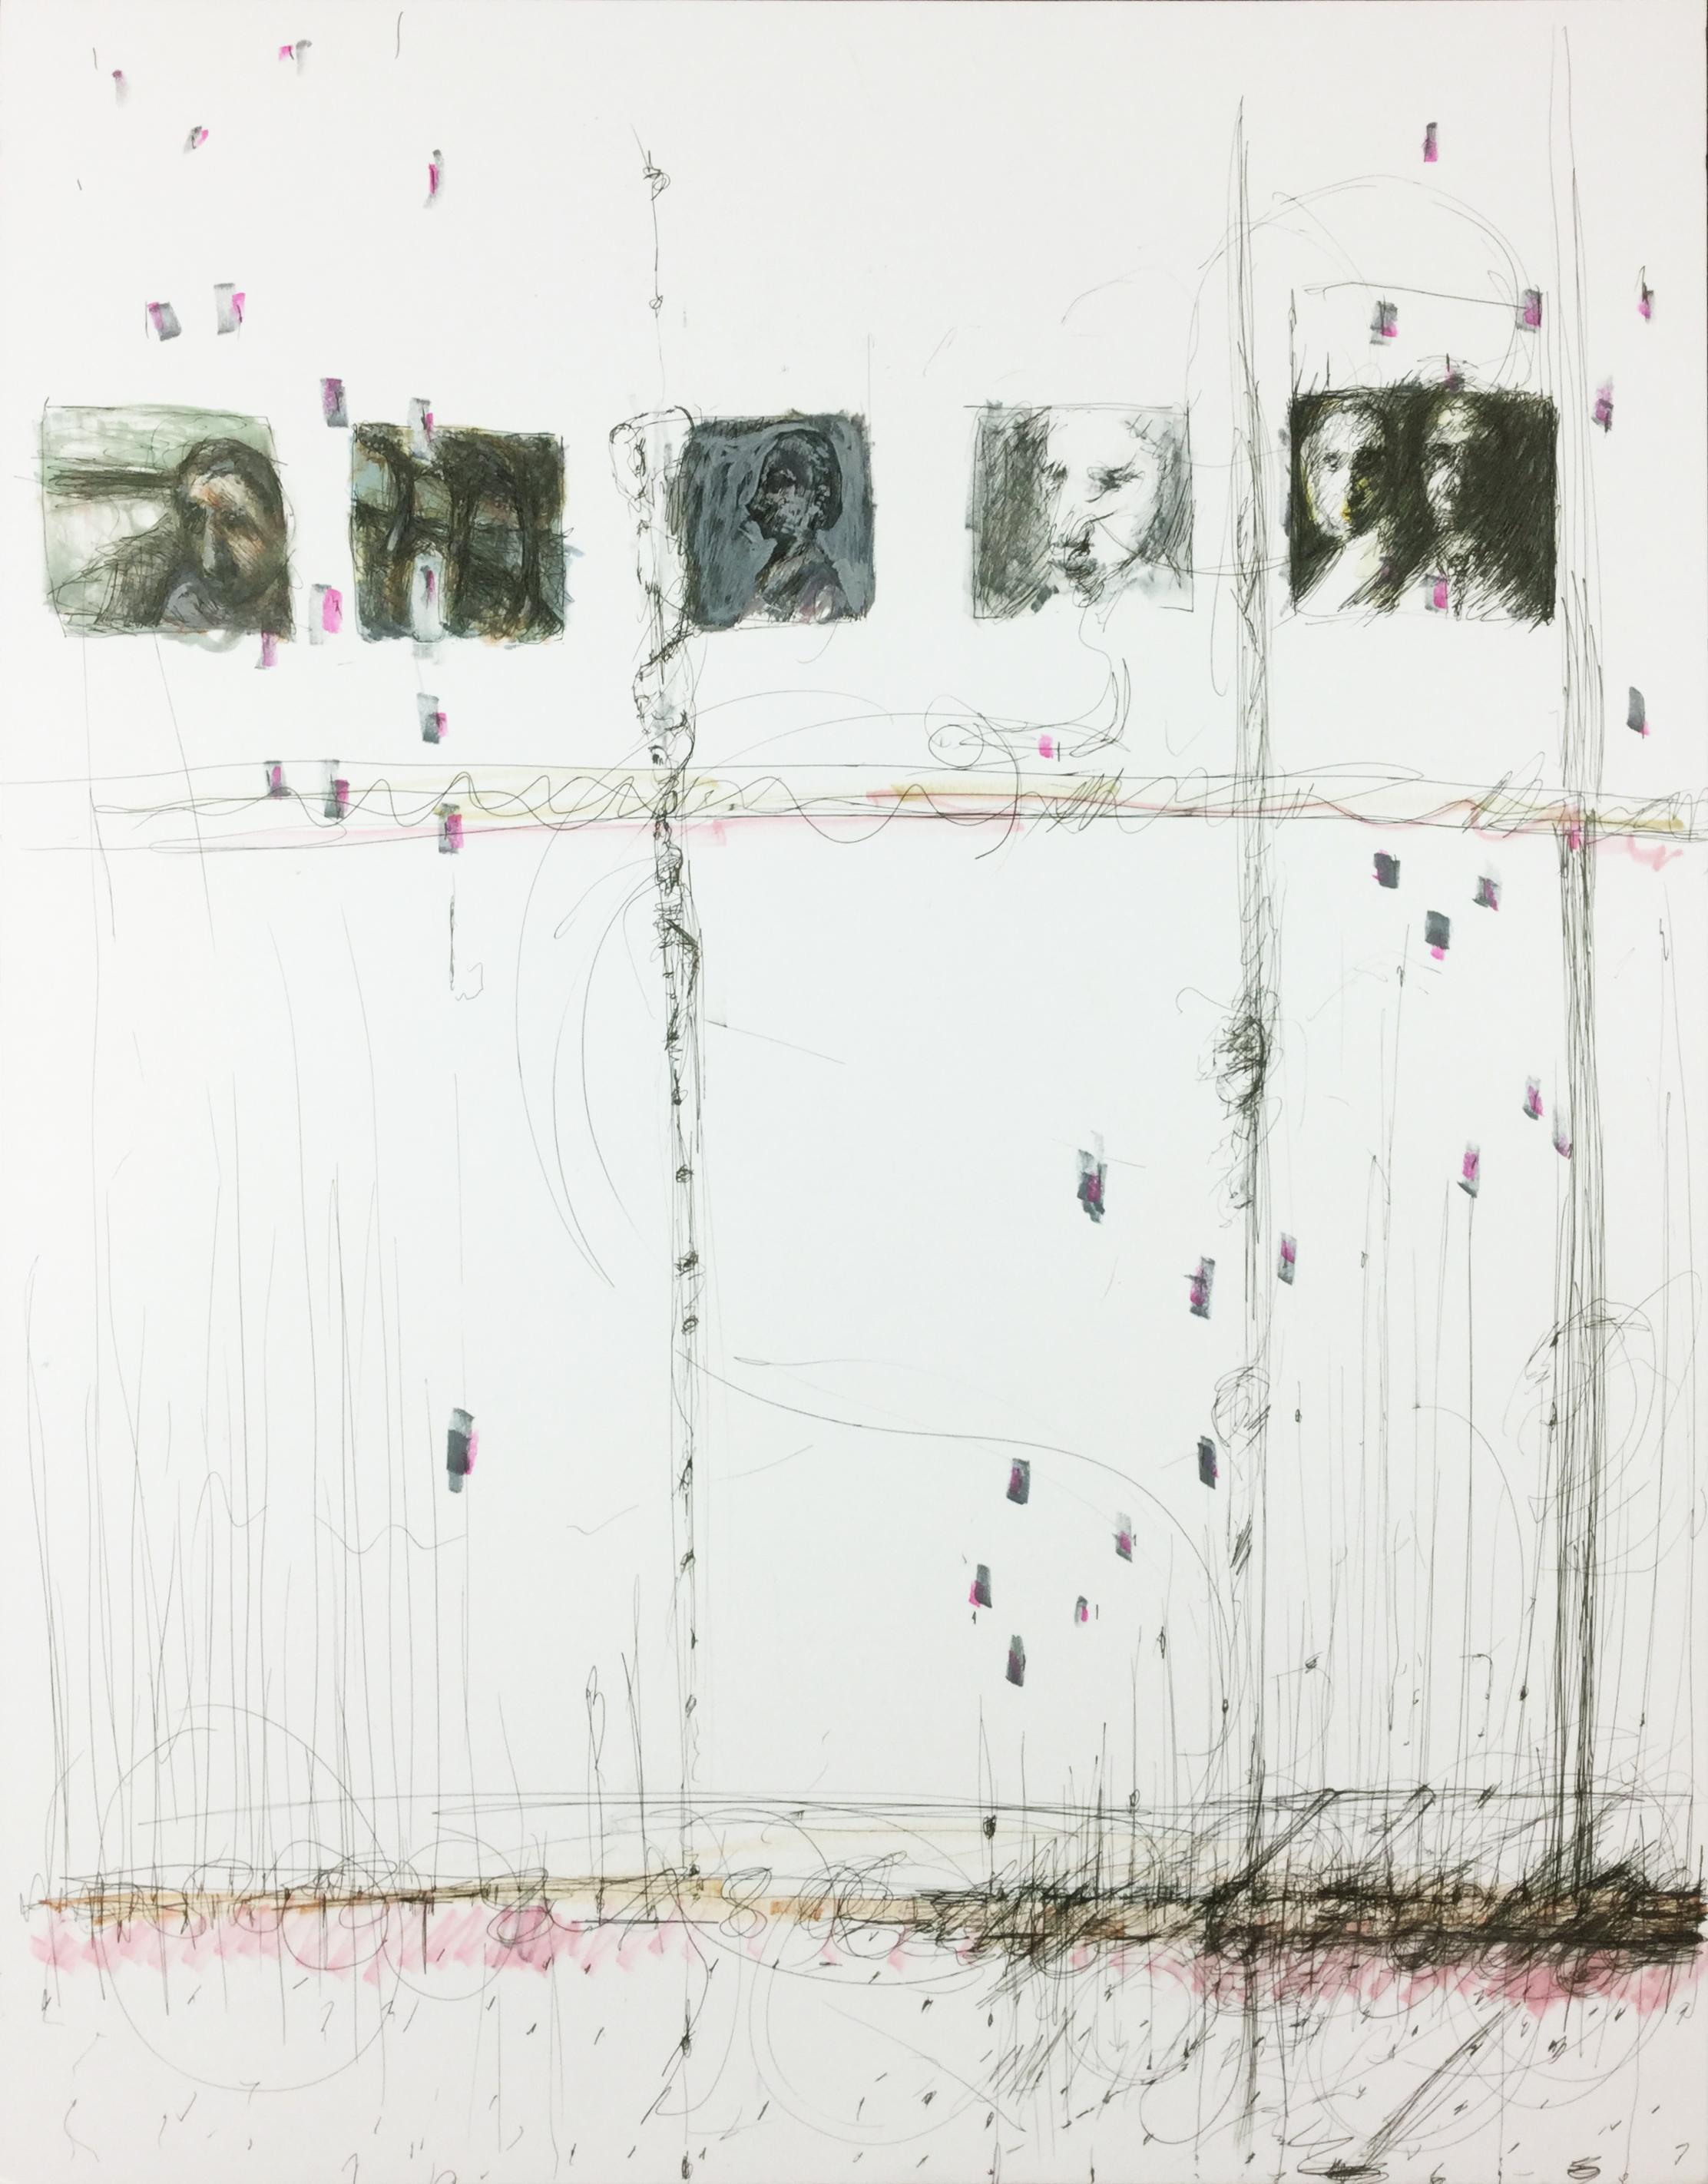 Untitled (569 8/15)